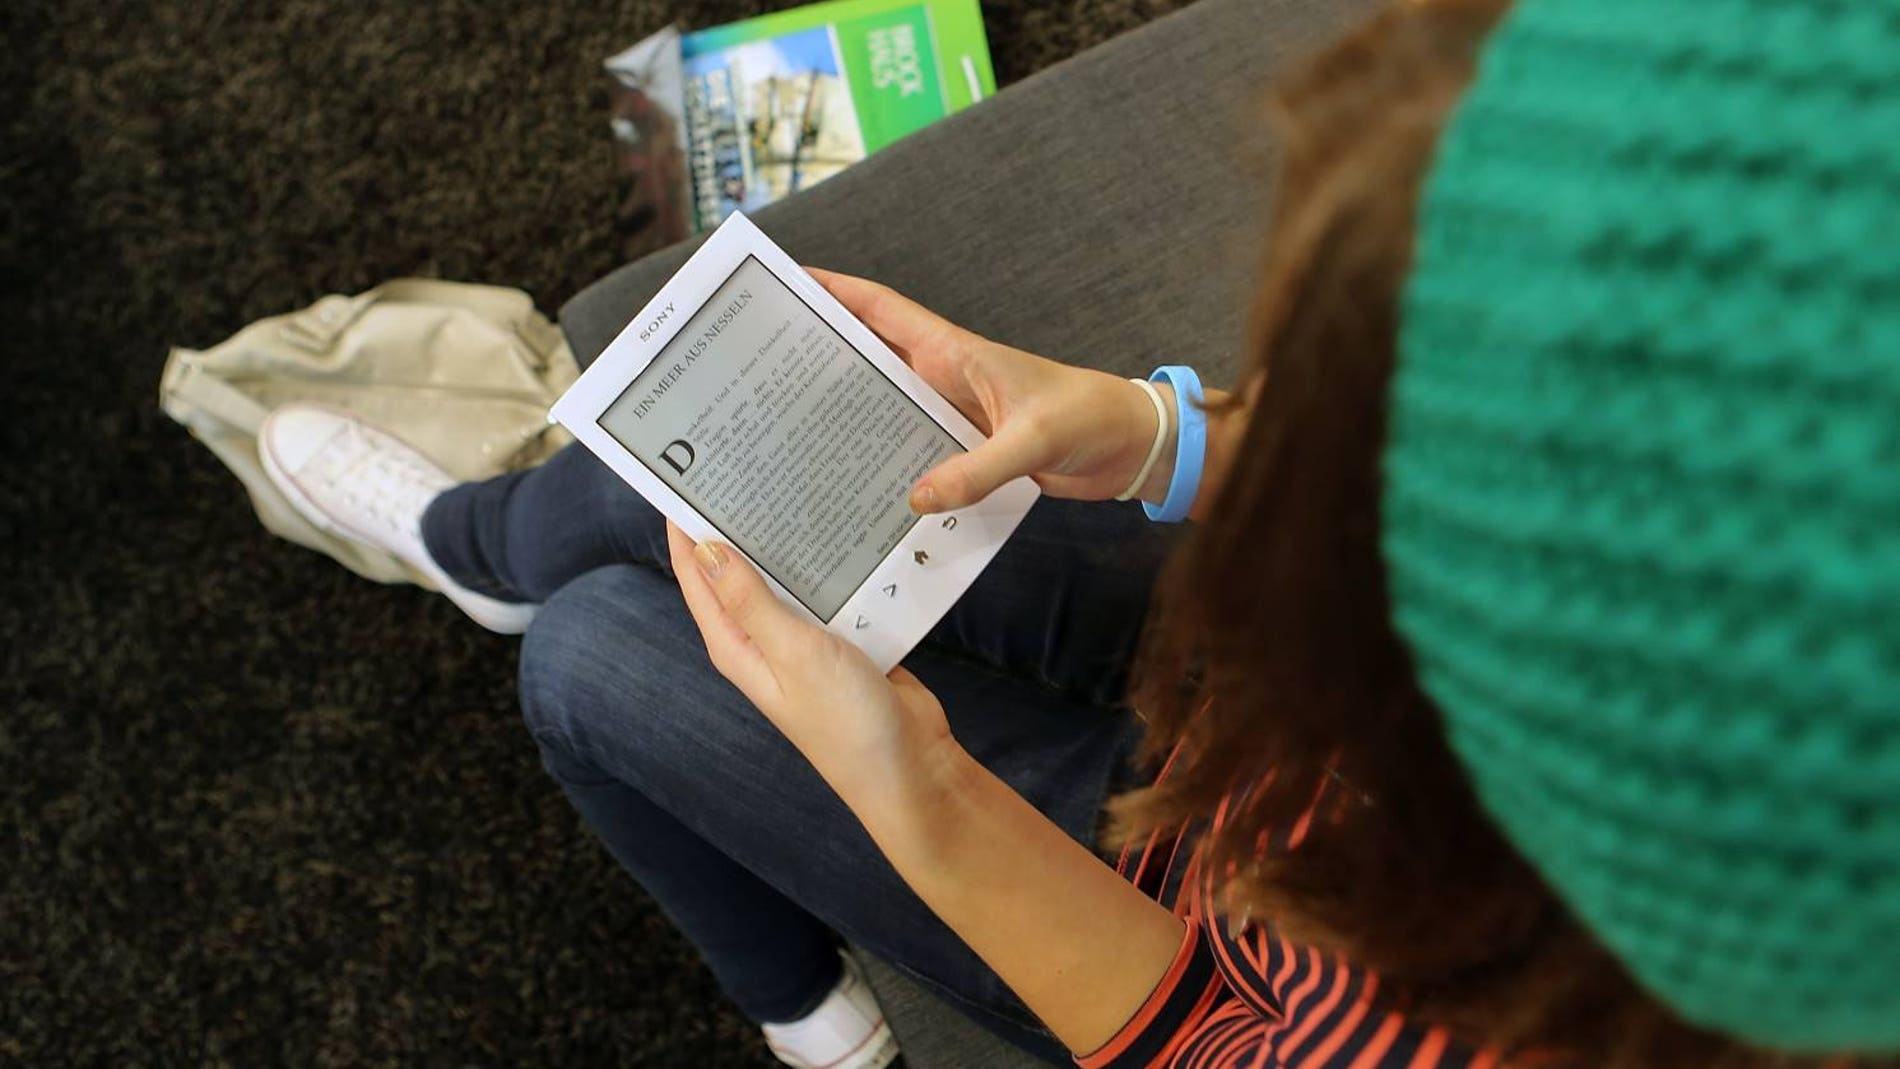 Una persona lee un e-book desde su e-reader